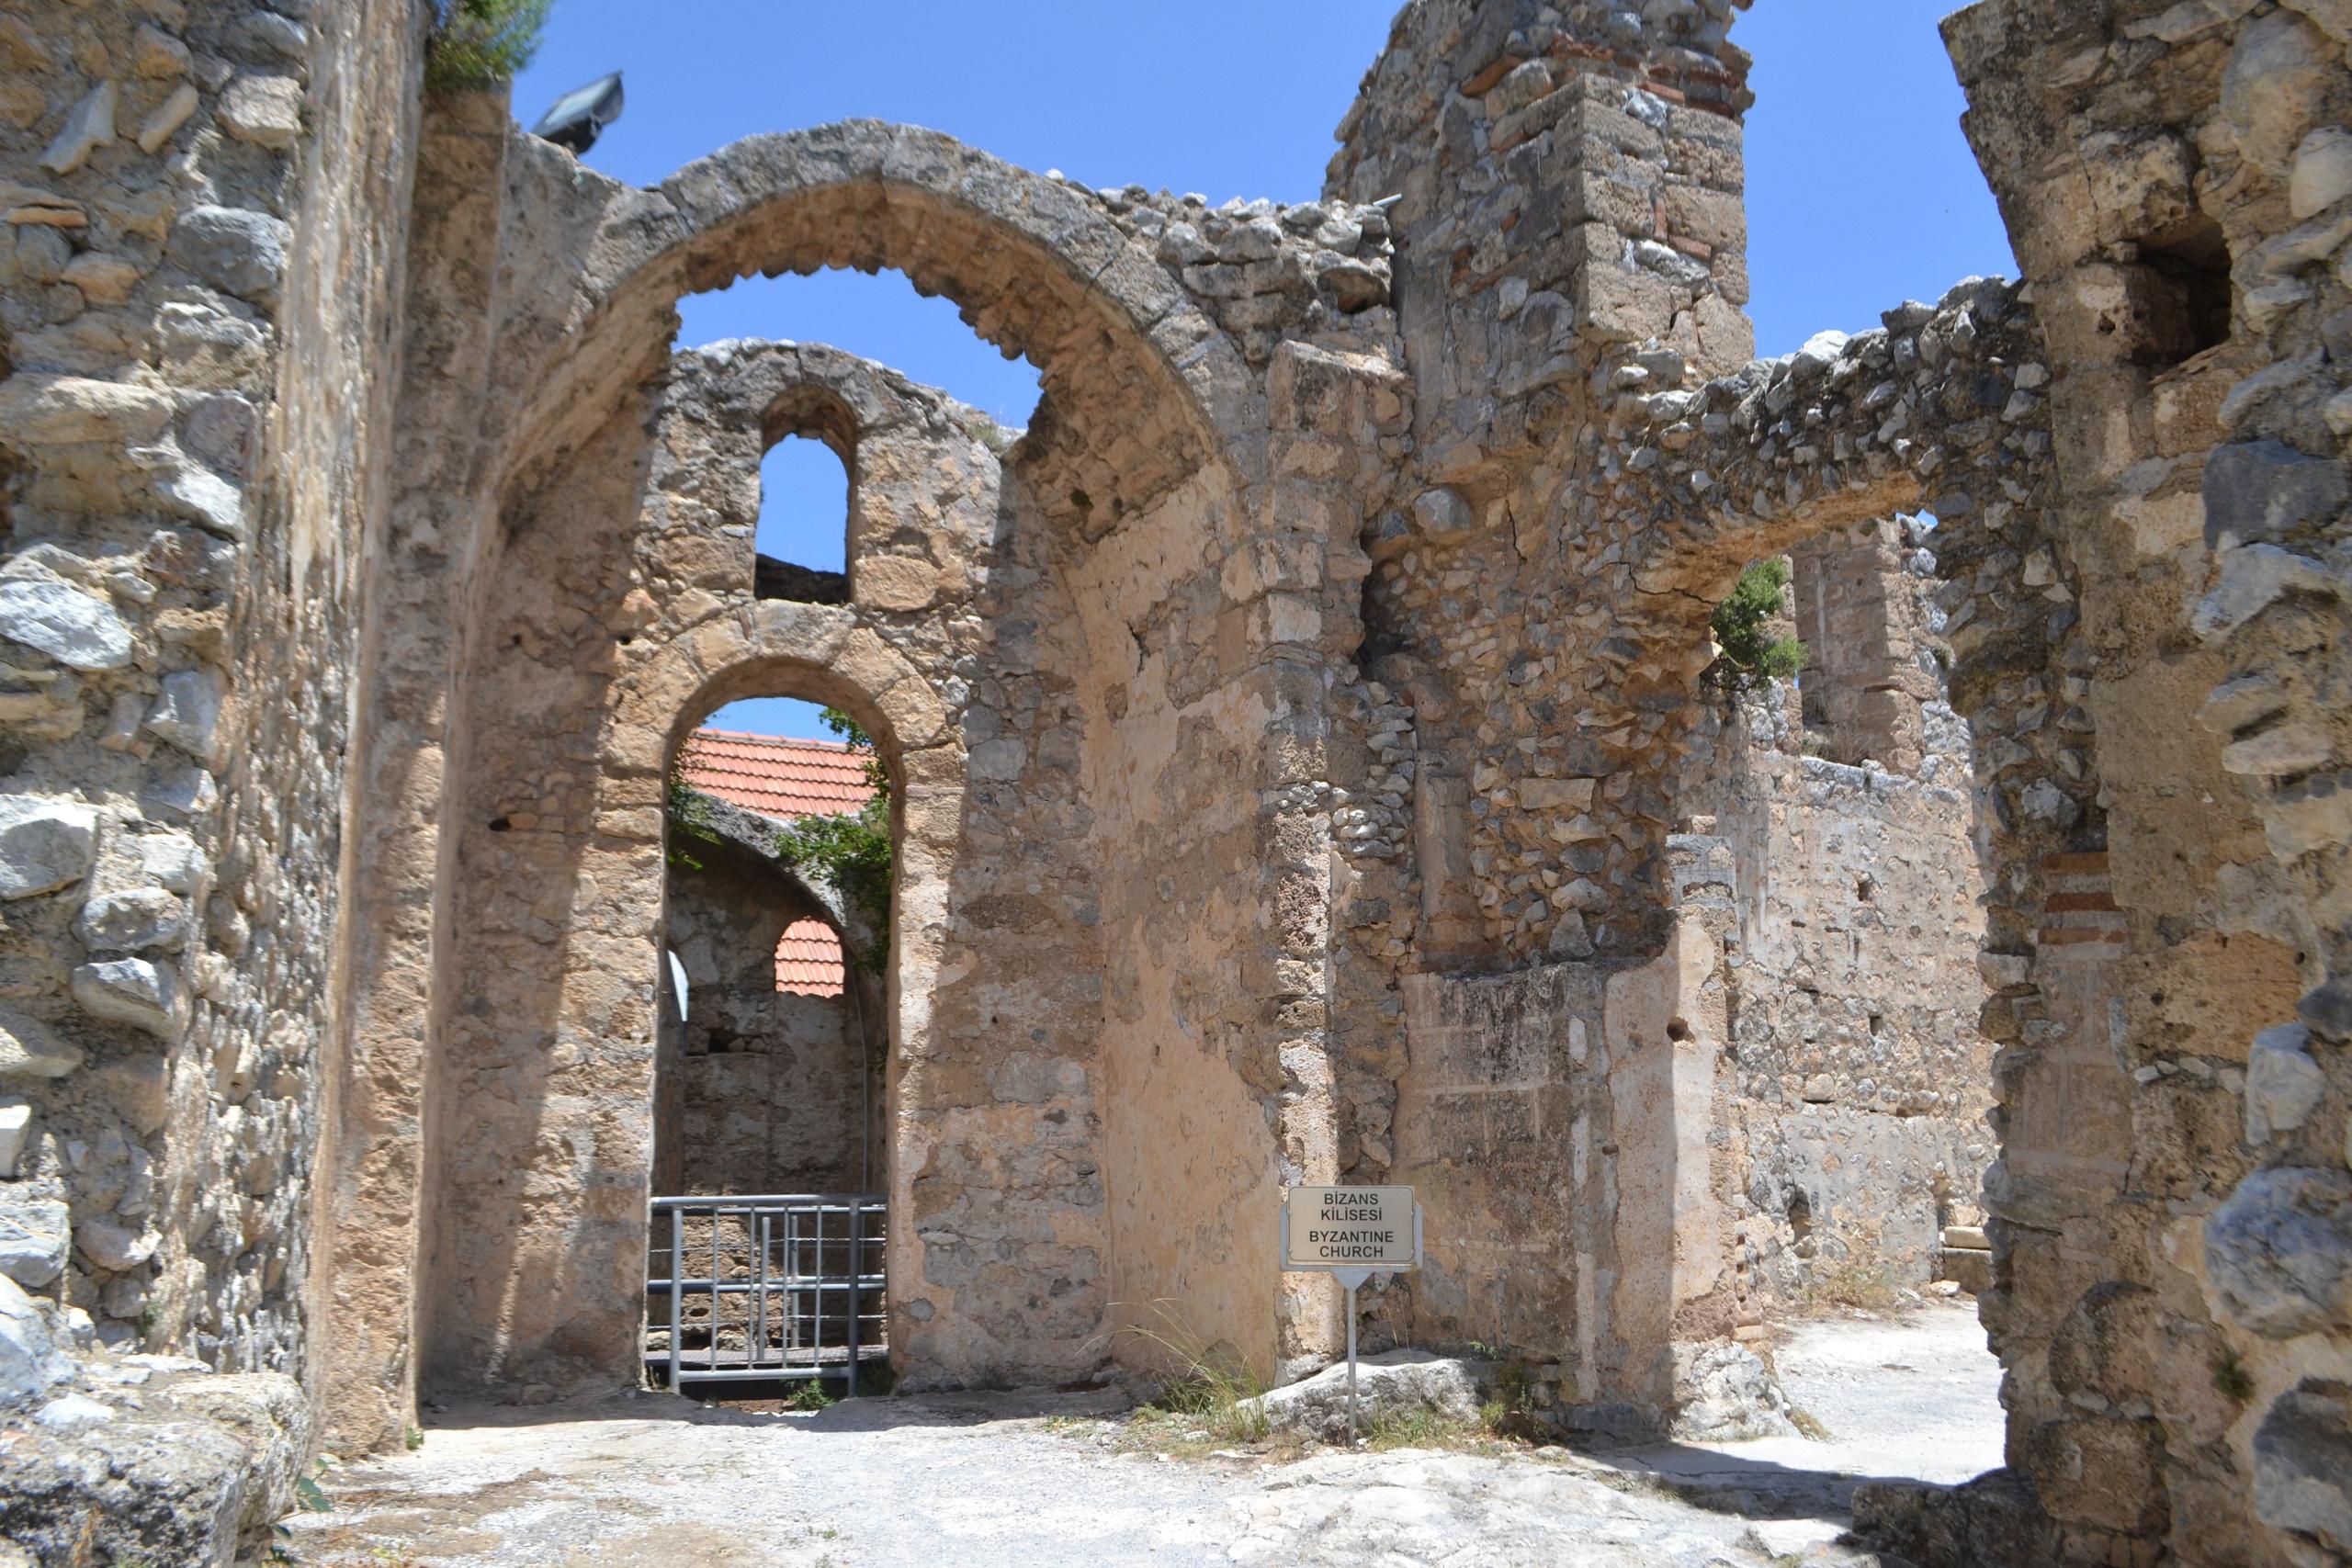 Северный Кипр. Замок Святого Иллариона. (фото). Z5nYAbwj4LI